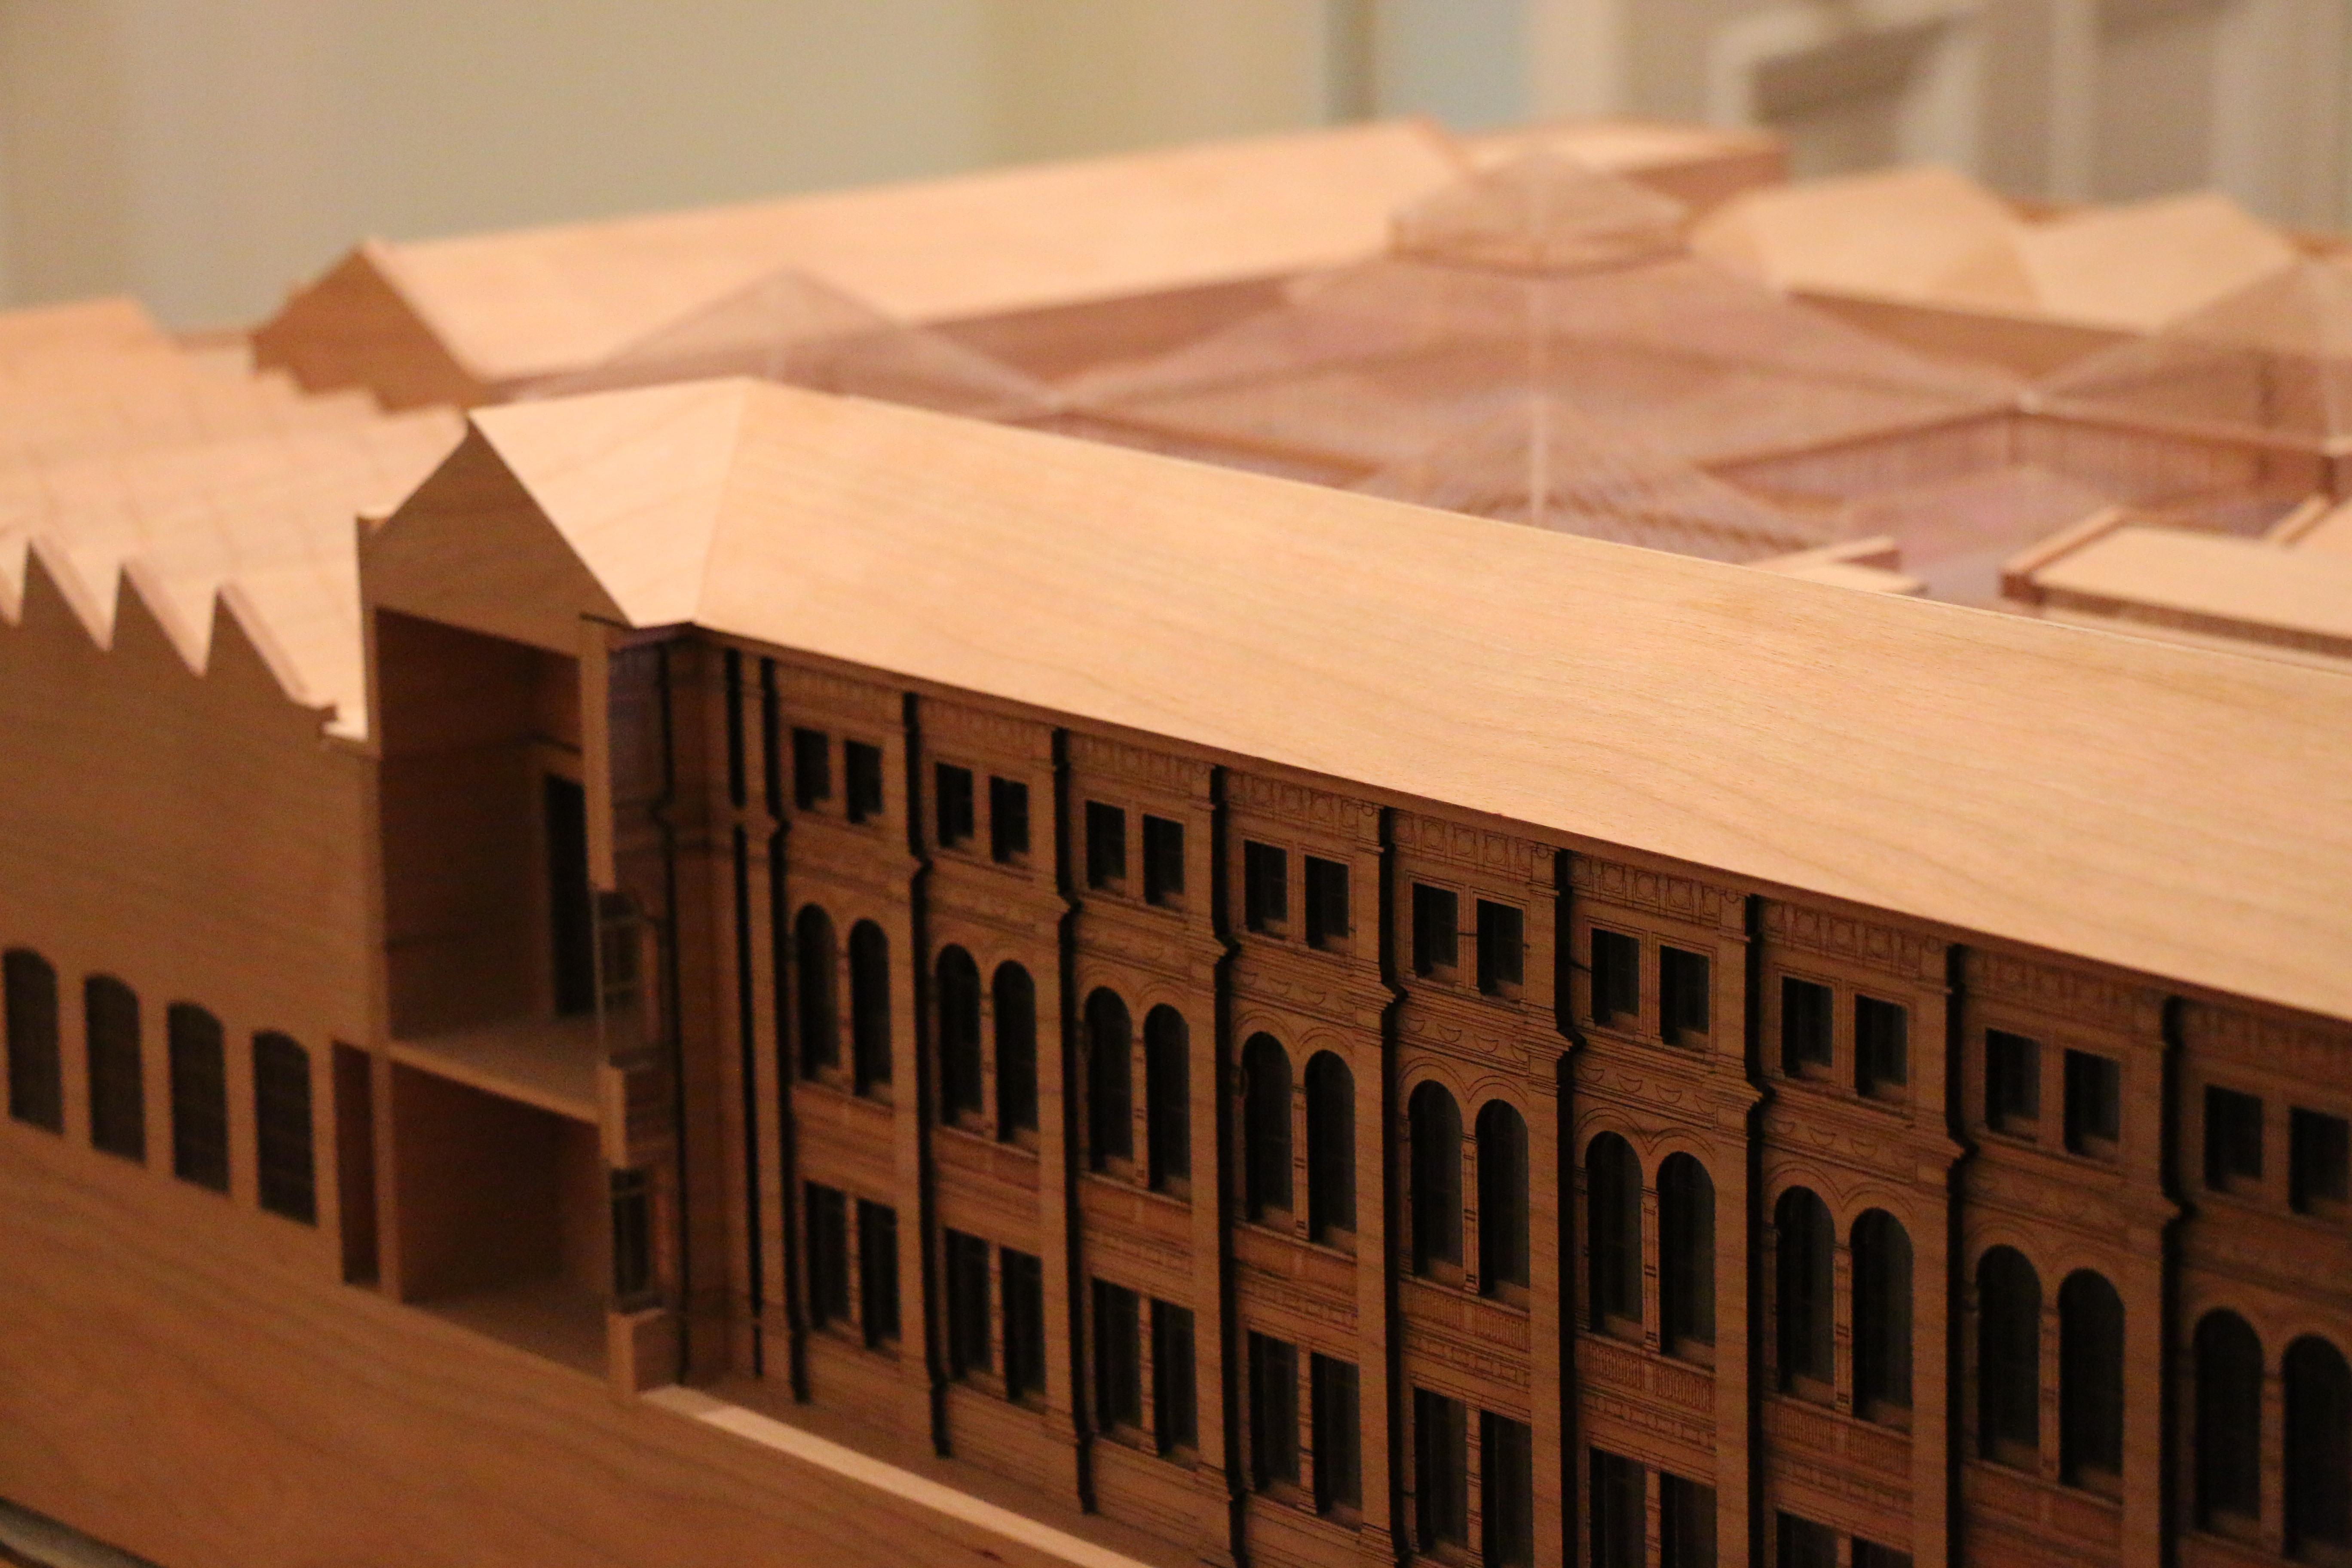 victoria and albert museum model